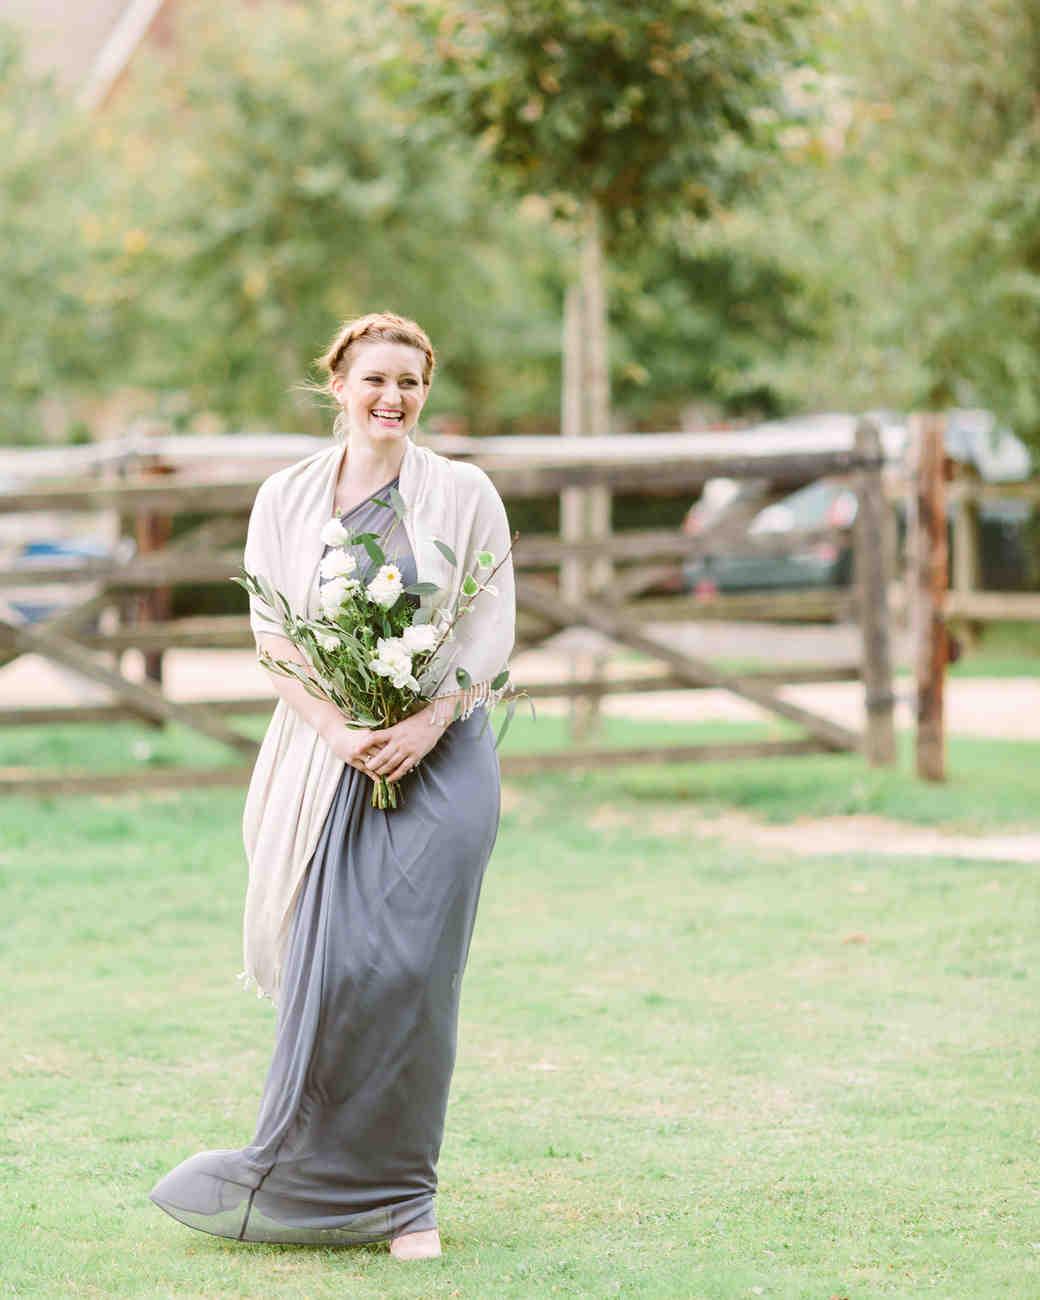 anneclaire-chris-wedding-france-bridesmaid-026-s113034-00716.jpg